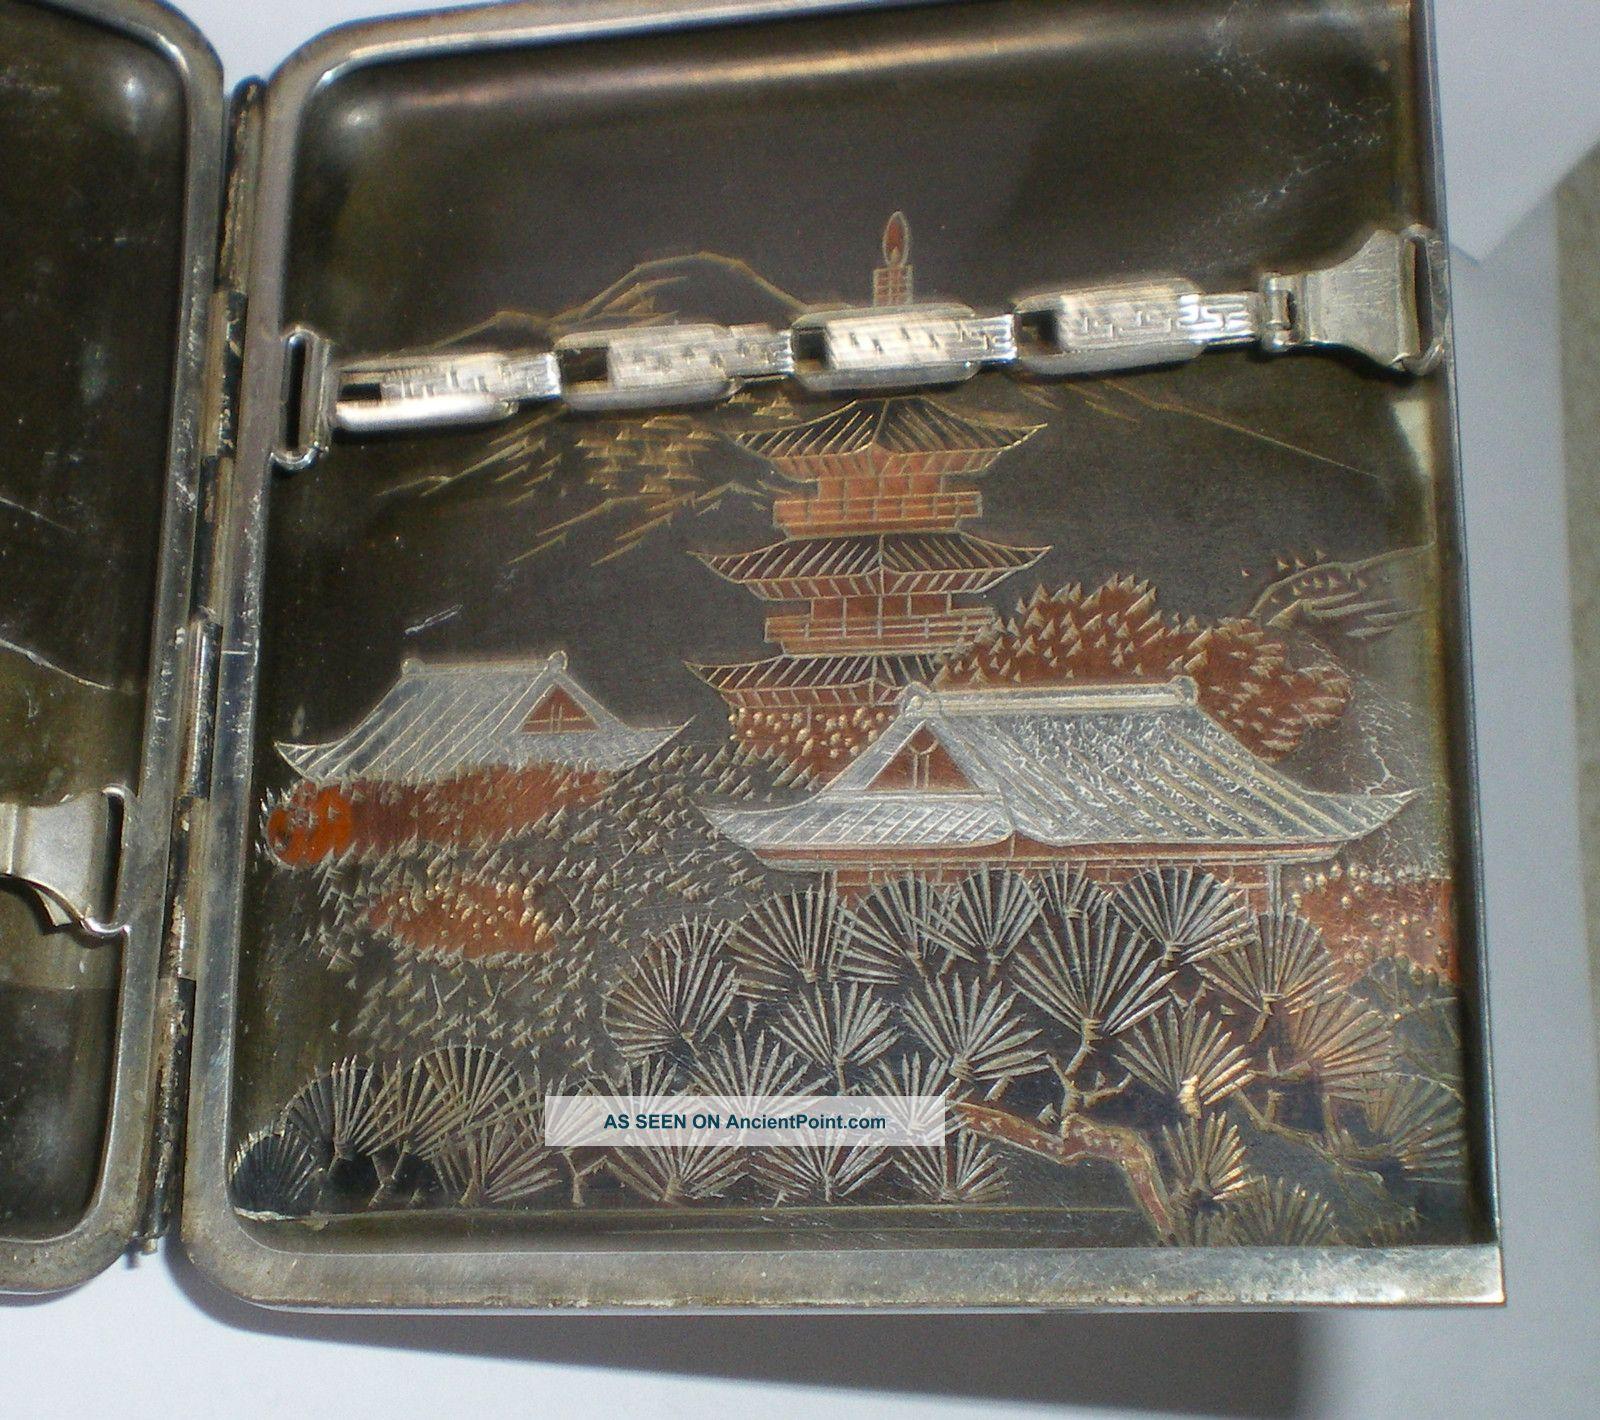 Vintage Solid Silver Japanese Cigarette Case Inlay Silver Bronze Not Scrap 158g Cigarette & Vesta Cases photo